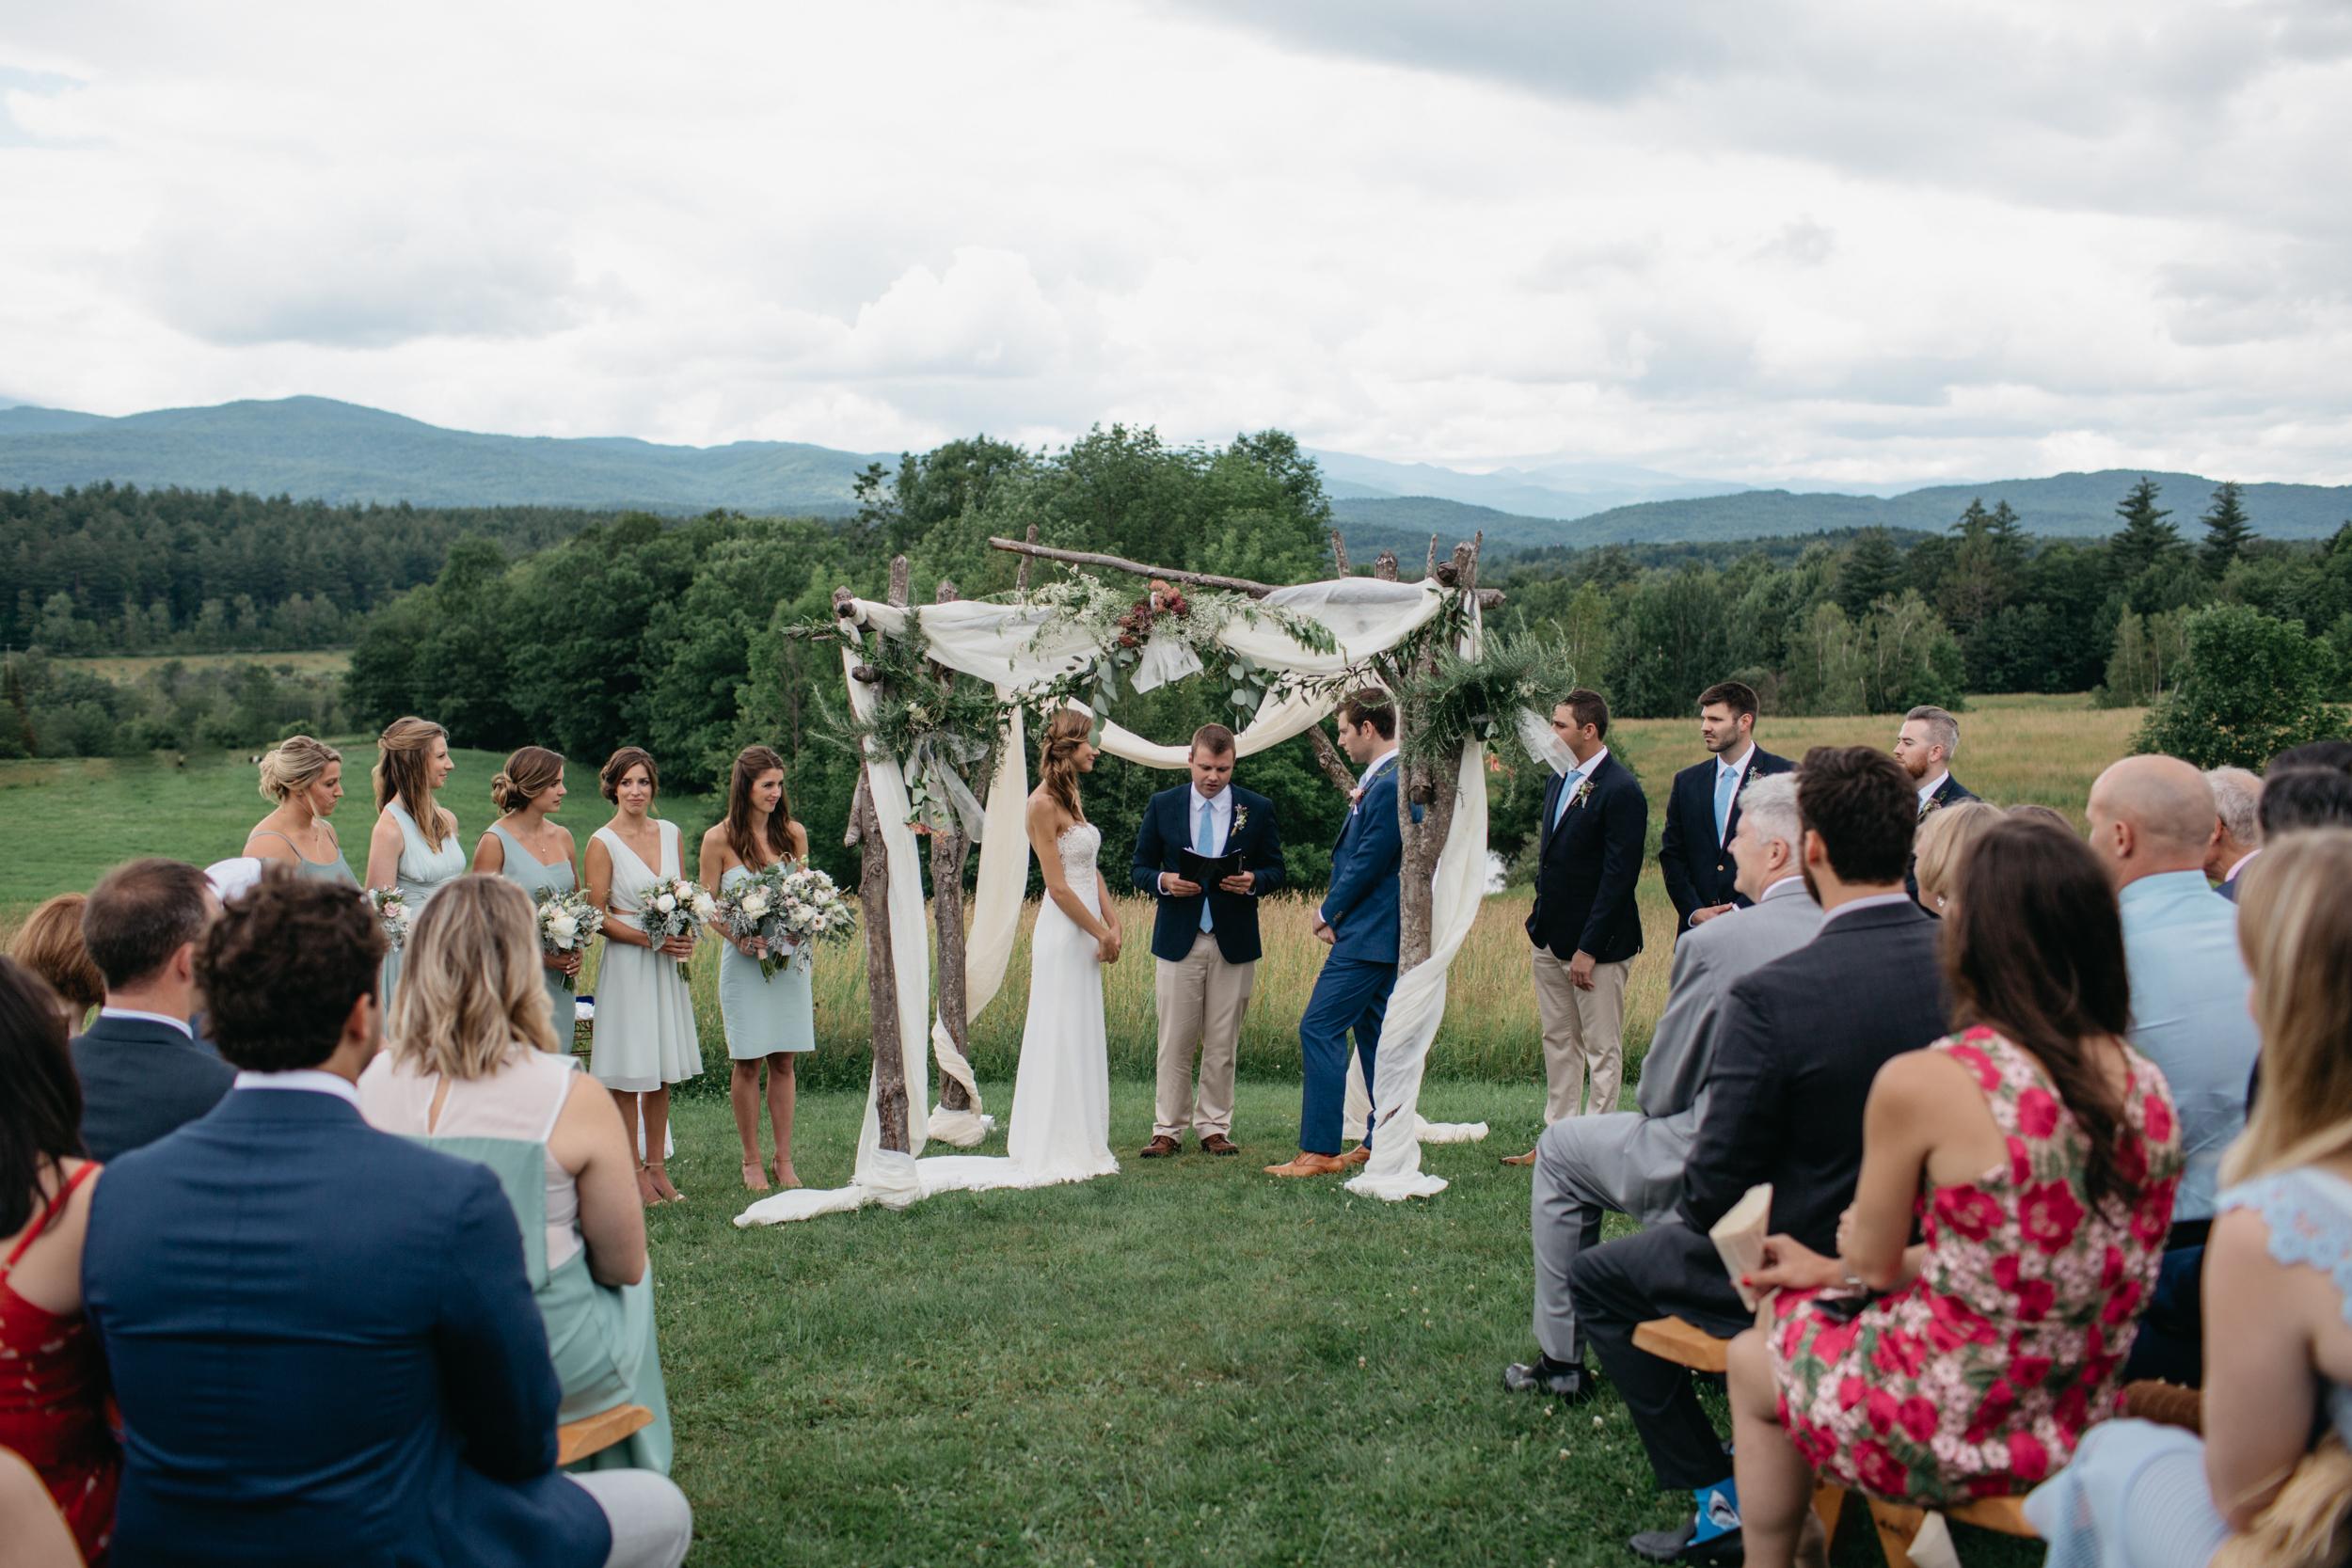 Karen_Alex_Bliss_ridge_farm_Vermont_wedding015.jpg